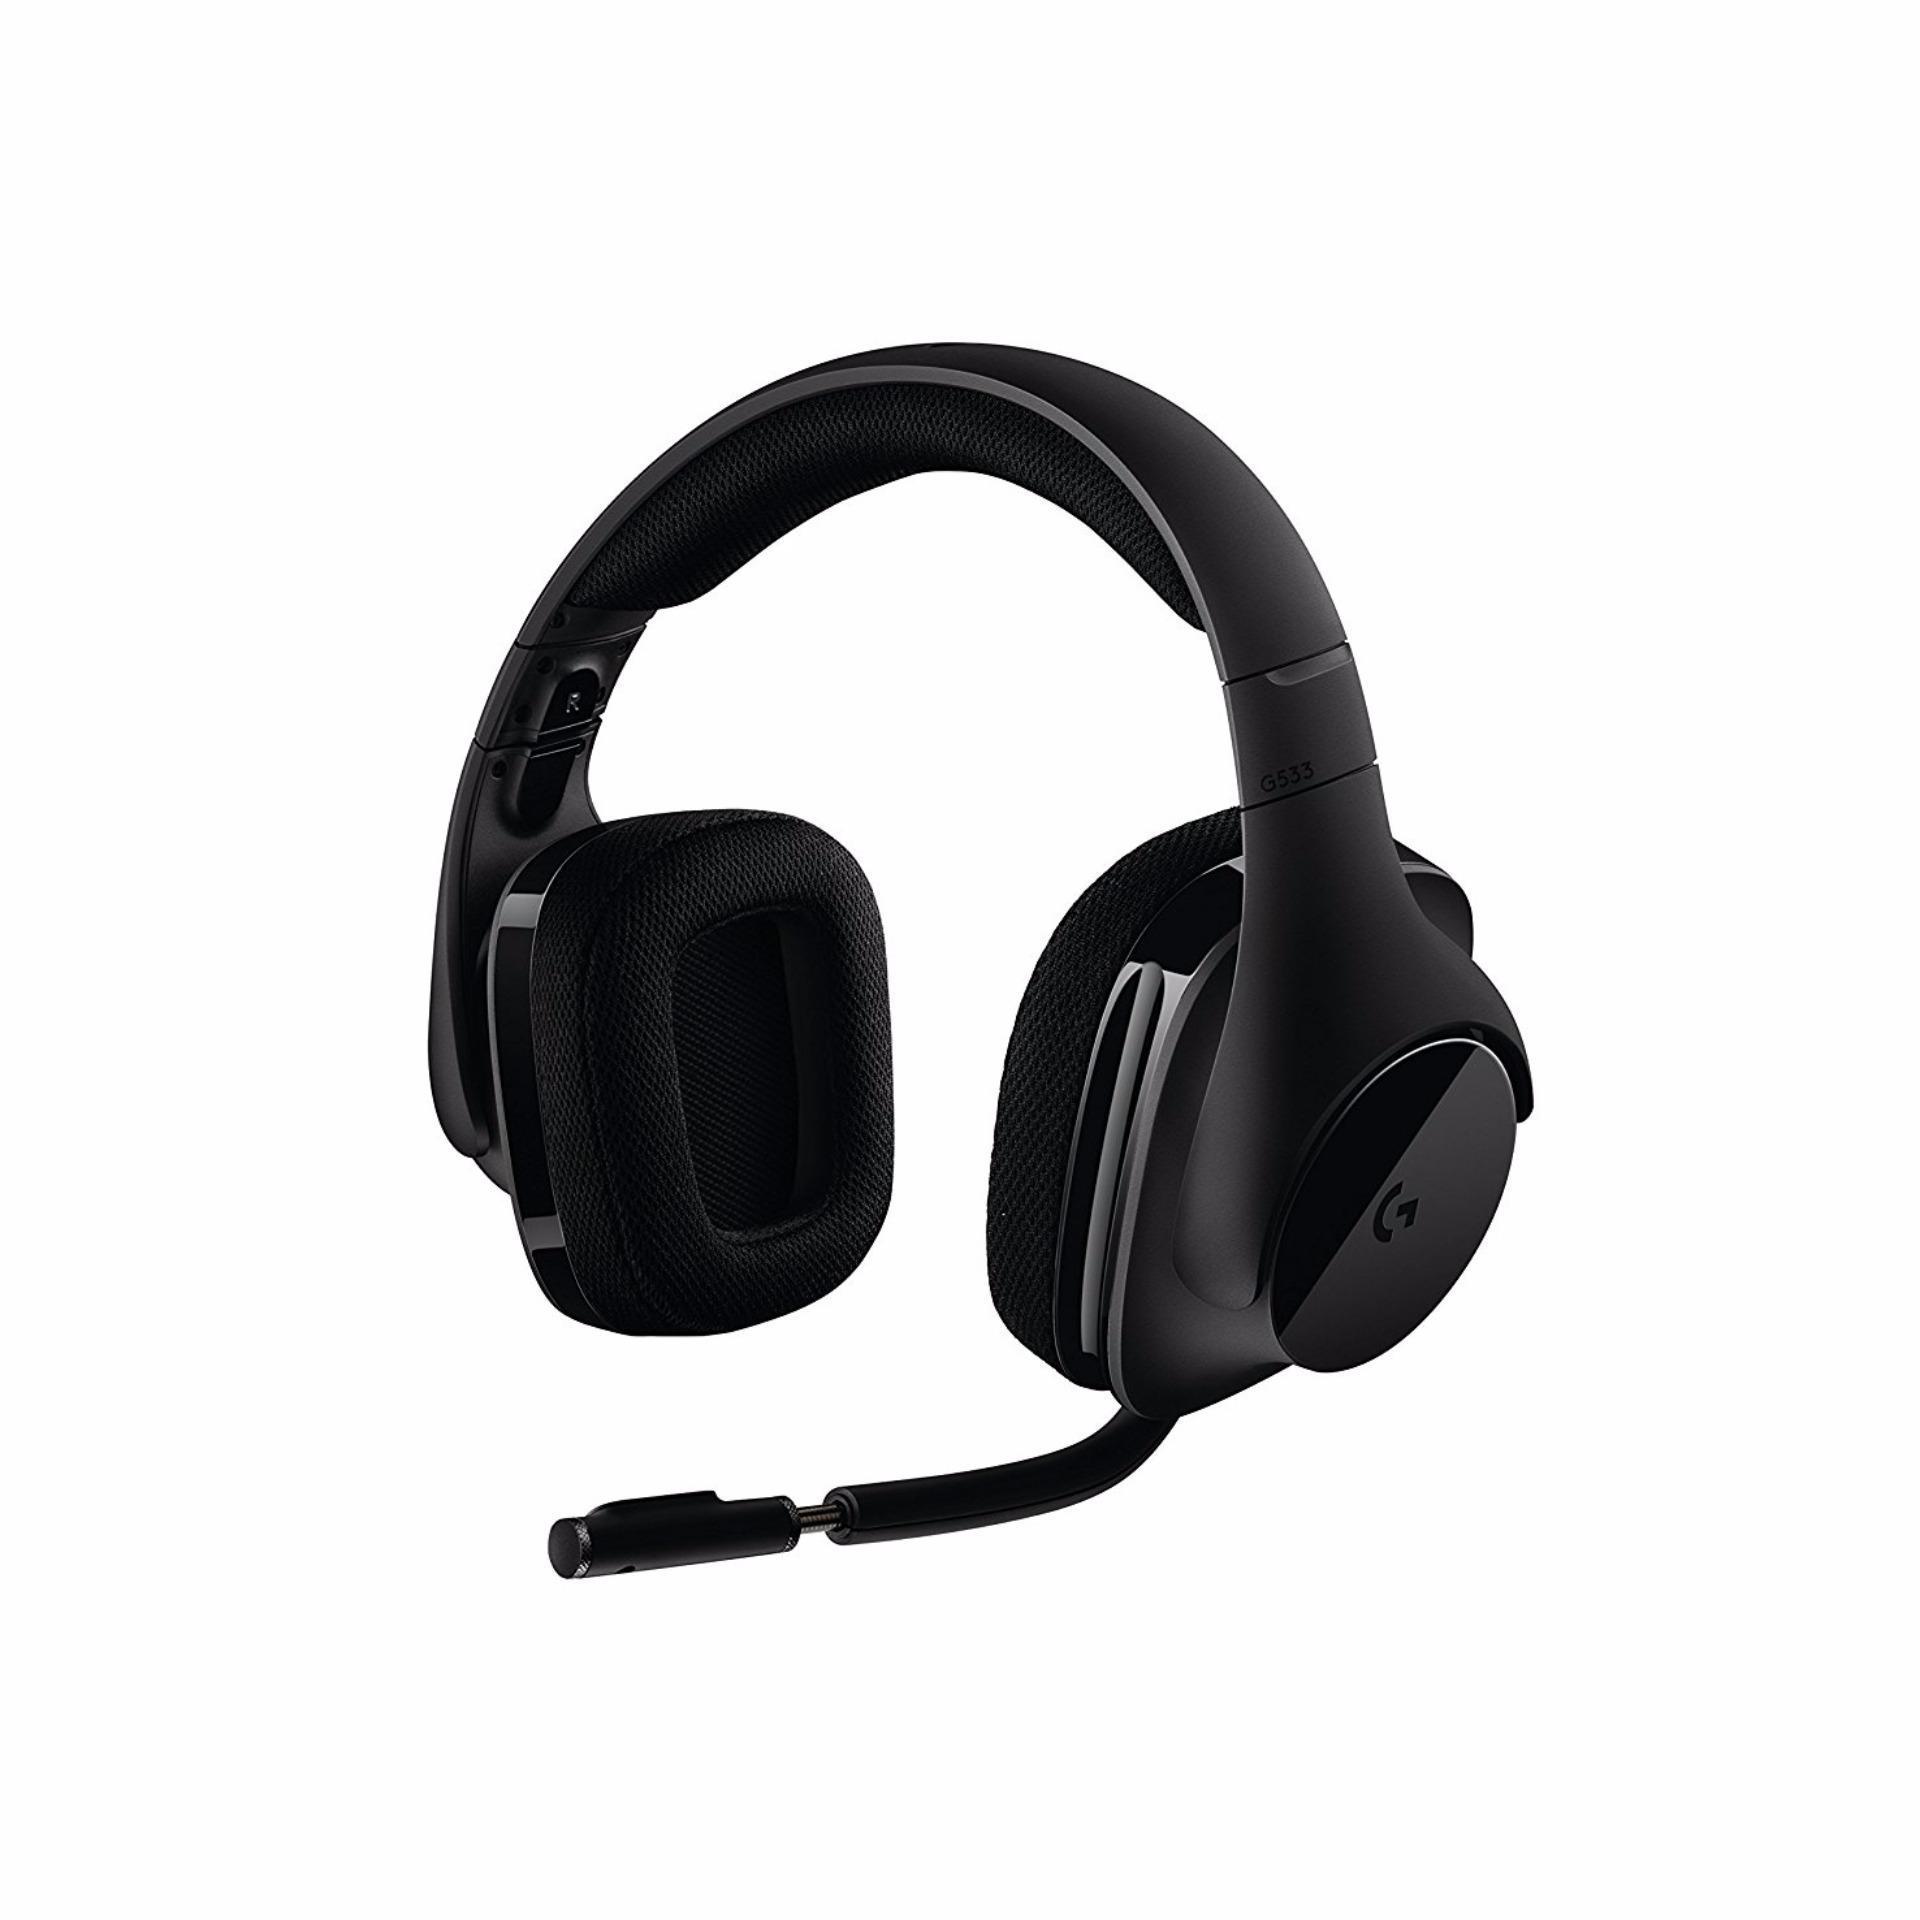 Price Checker Logitech G533 Wireless Dts 71 Surround Sound Gaming Sades Headset Tpower Sa 701 Flash Sale Intl